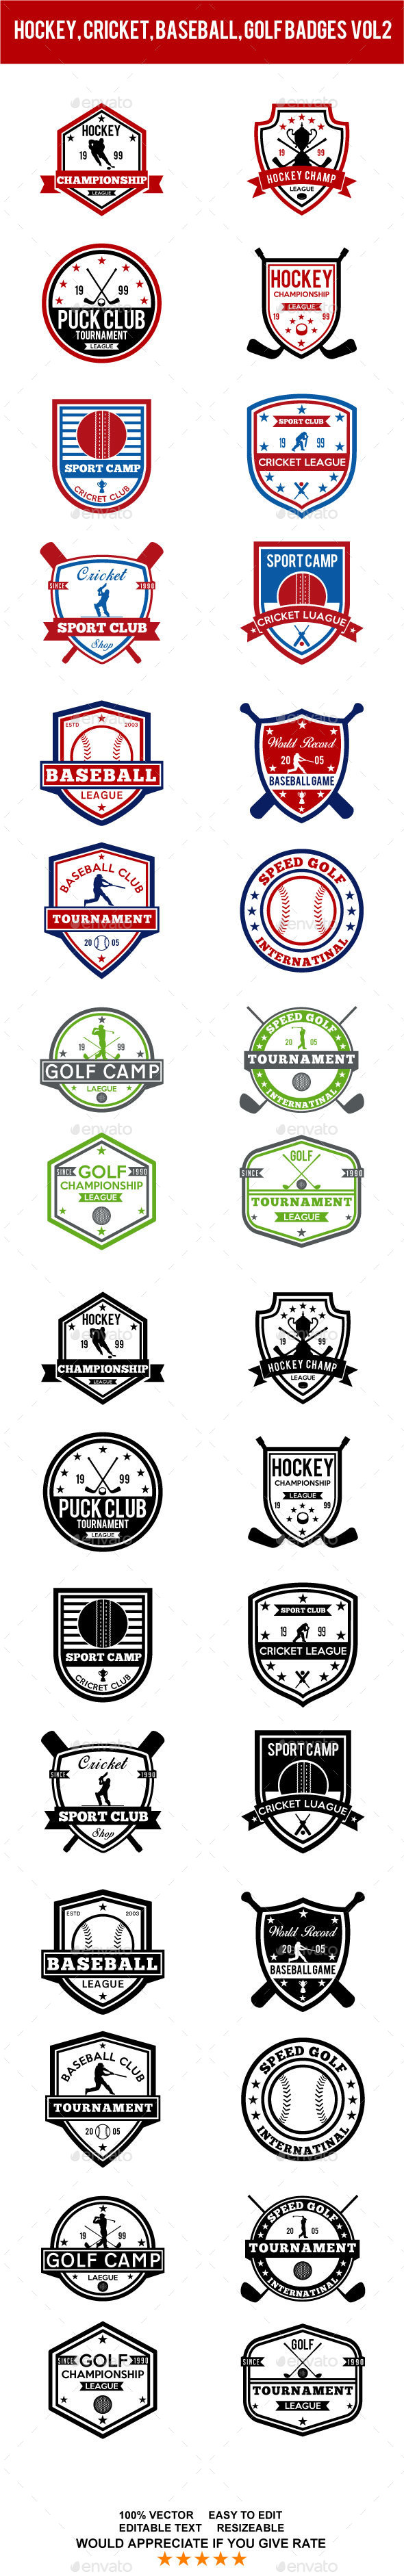 baseball, golf, cricket, hockey badges vol2 - Badges & Stickers Web Elements